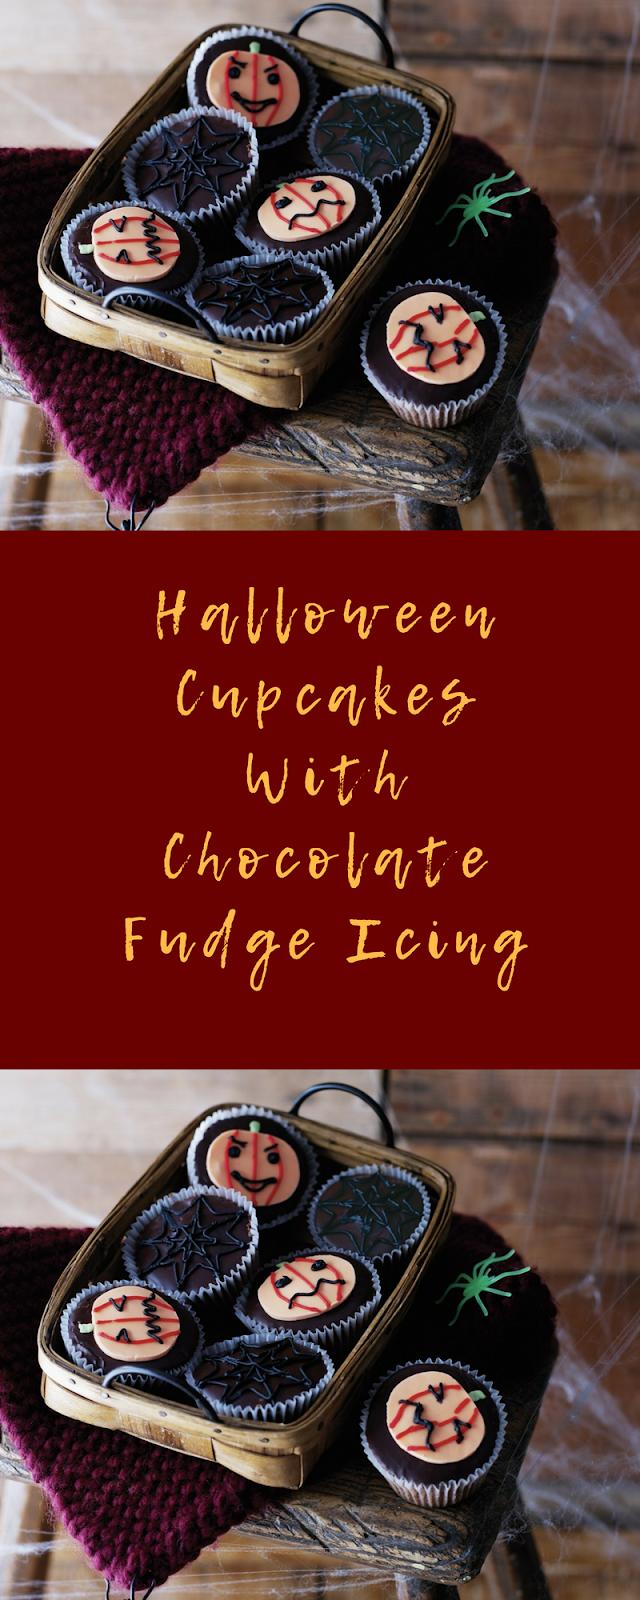 Halloween Cupcakes With Chocolate Fudge Icing